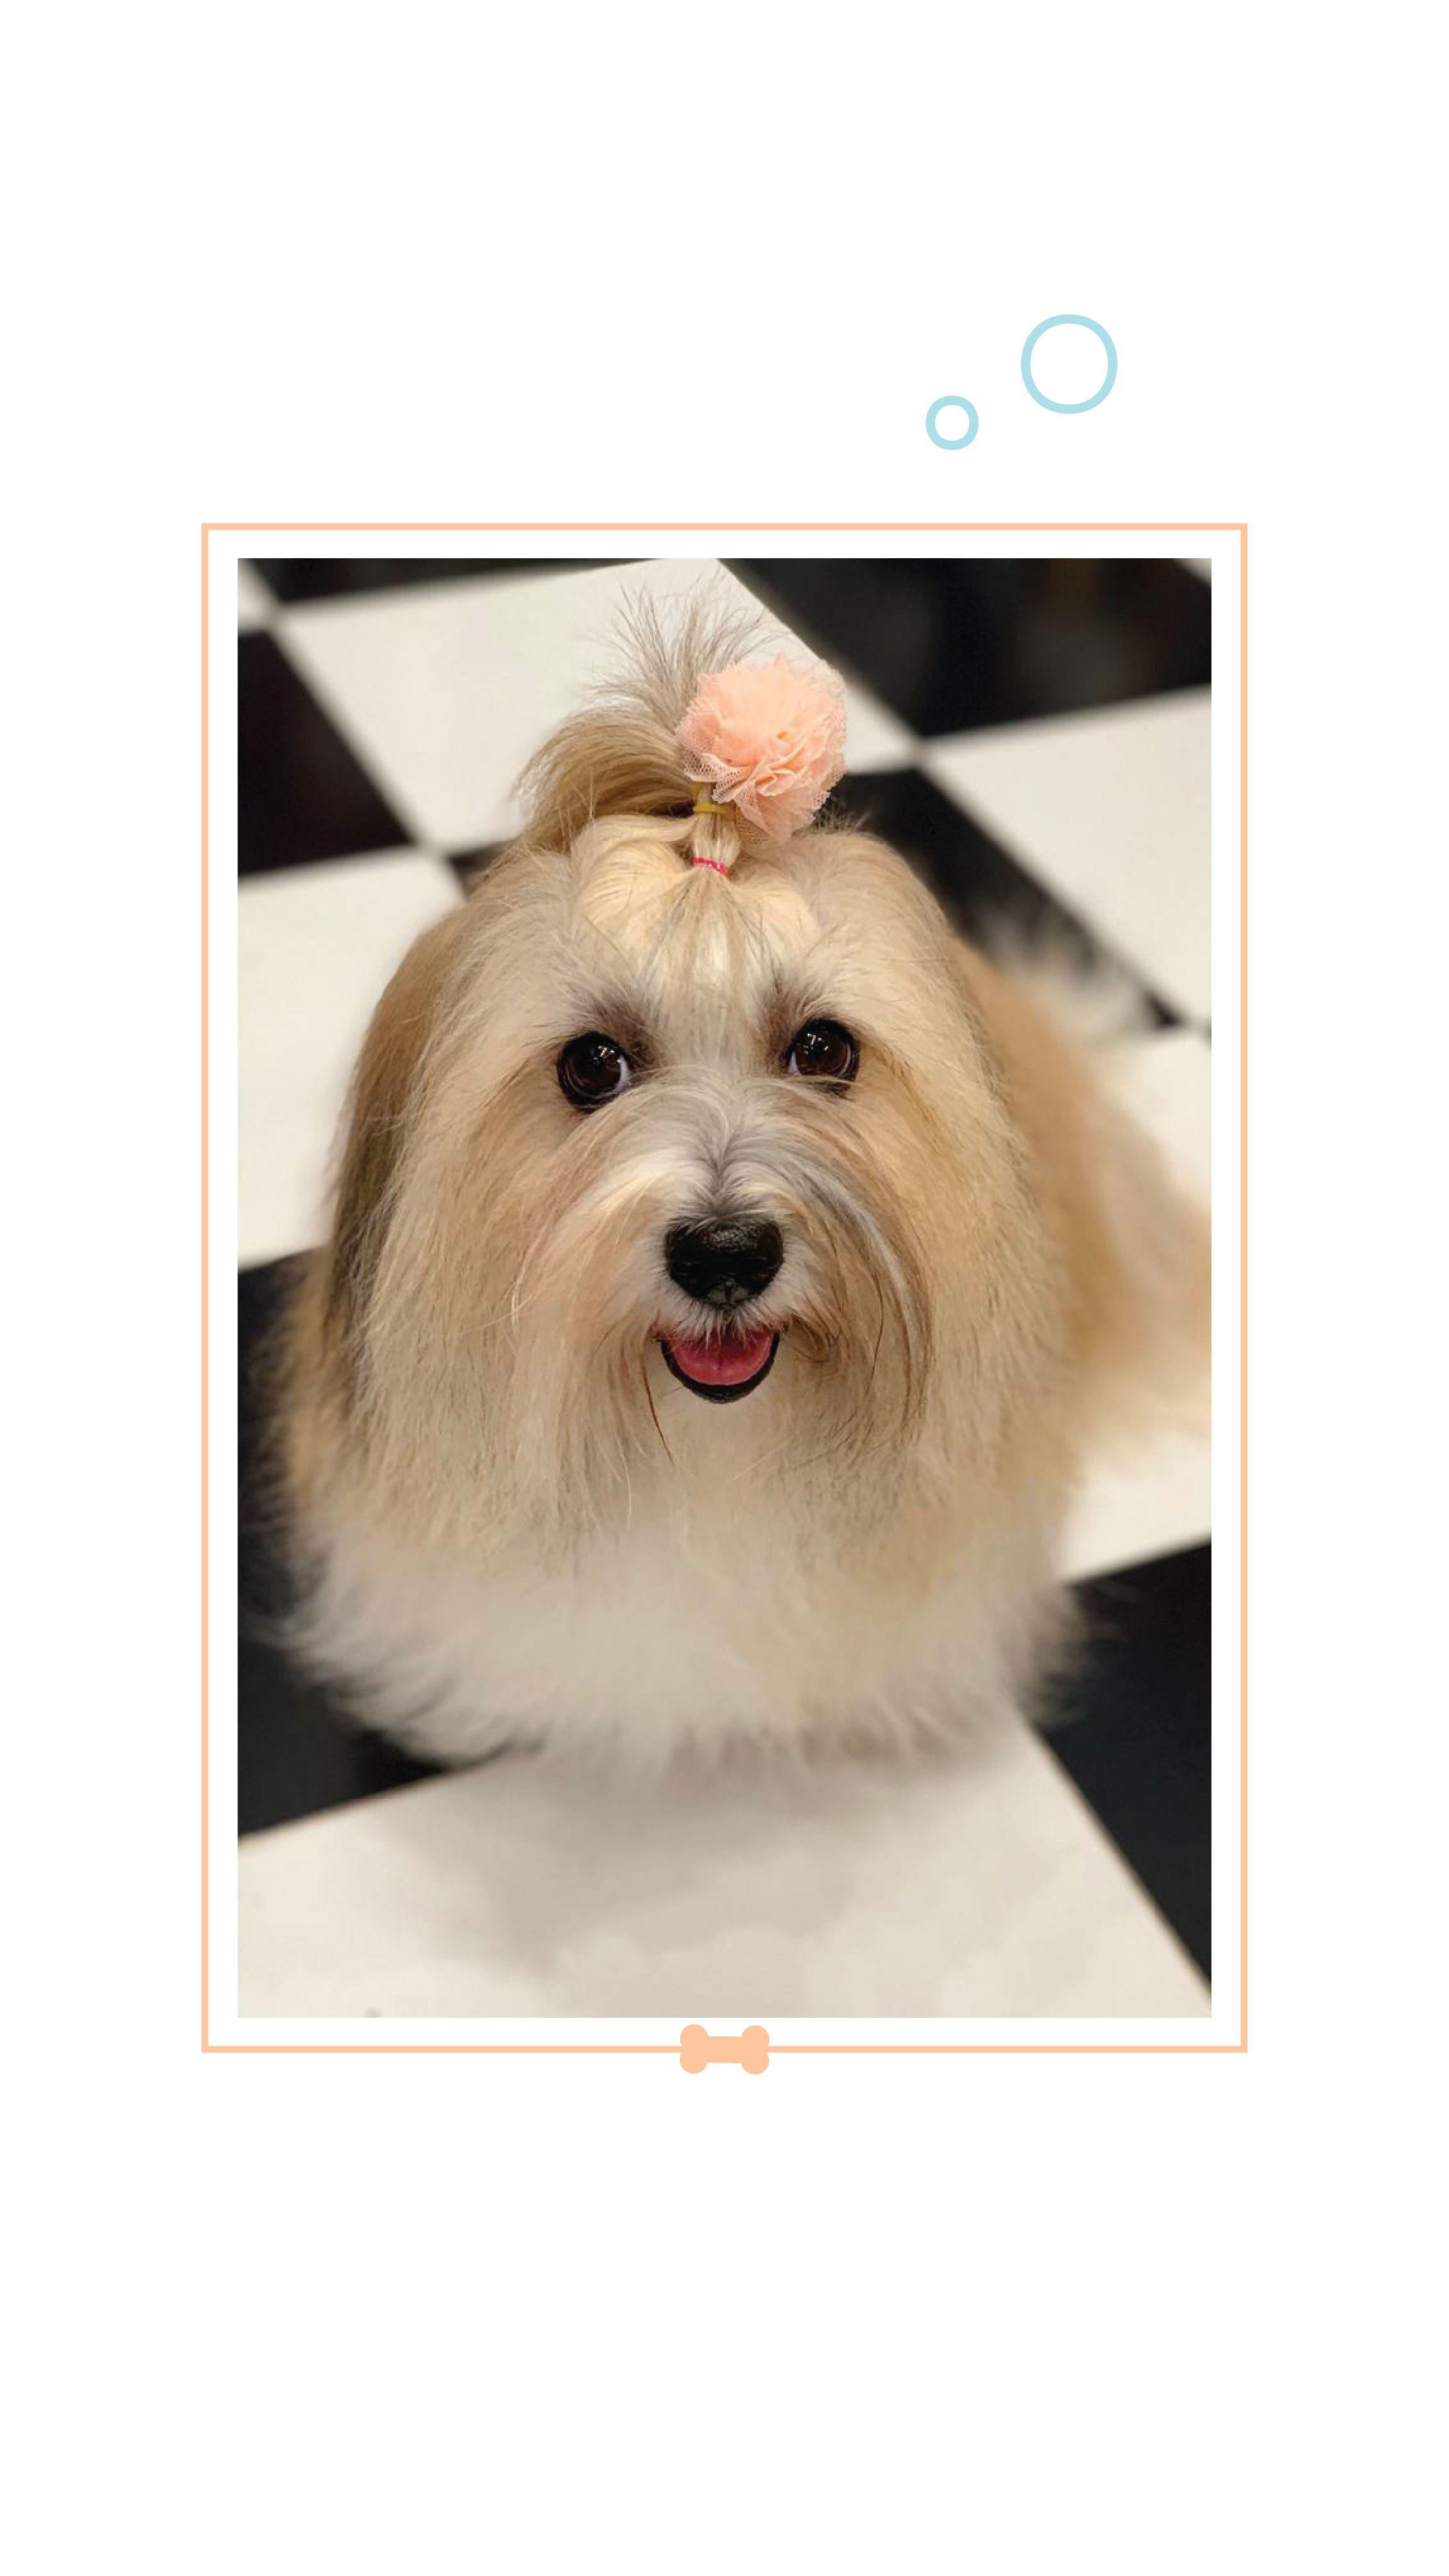 Spa For Dogs Headsupfortails Buy Pets Online Pet Supplies Pet Supplies